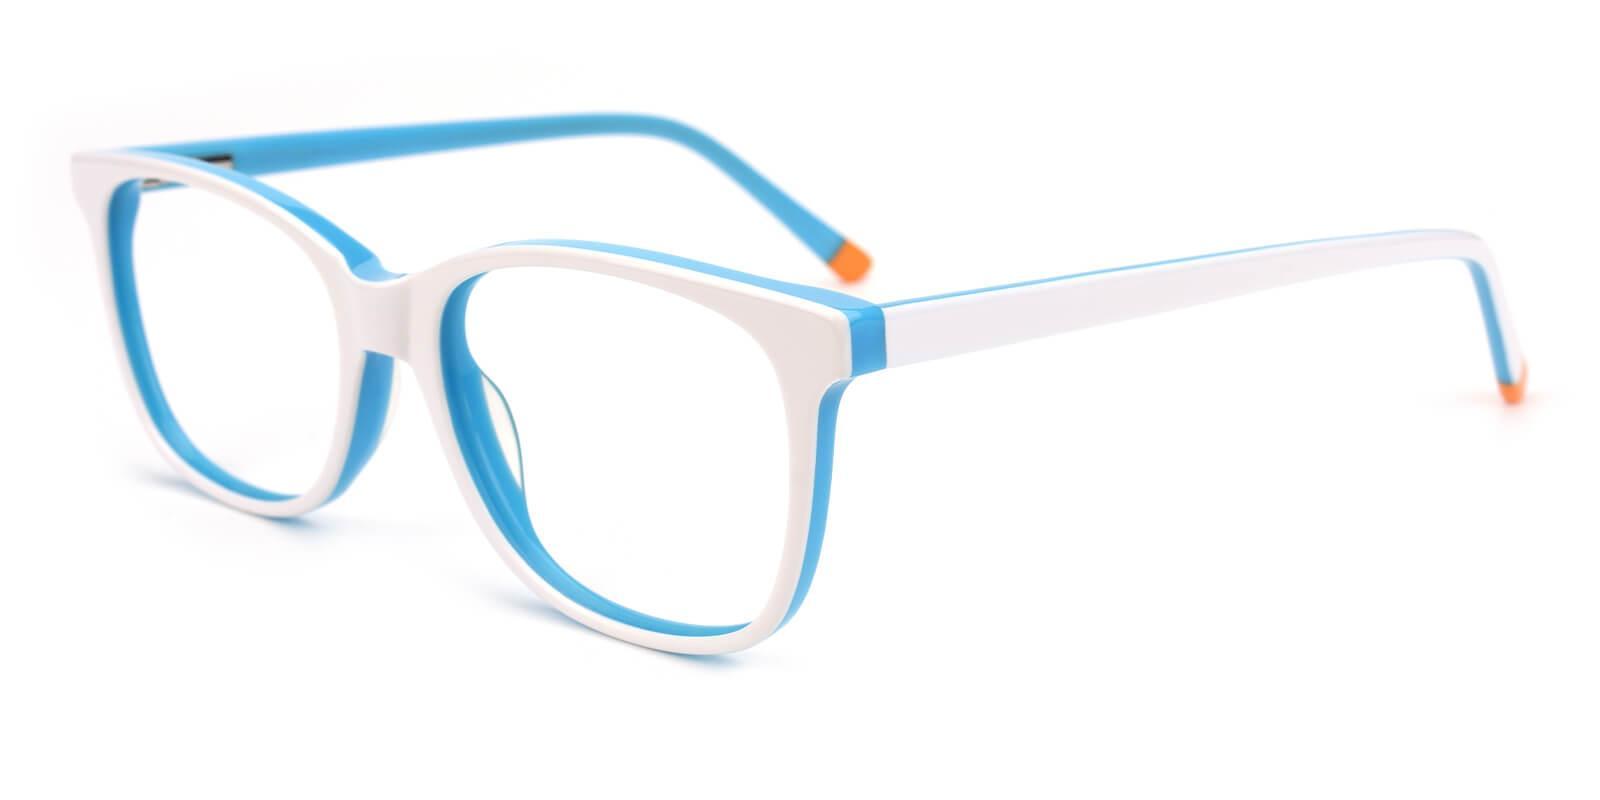 Sandwich-White-Square-Acetate-Eyeglasses-additional1